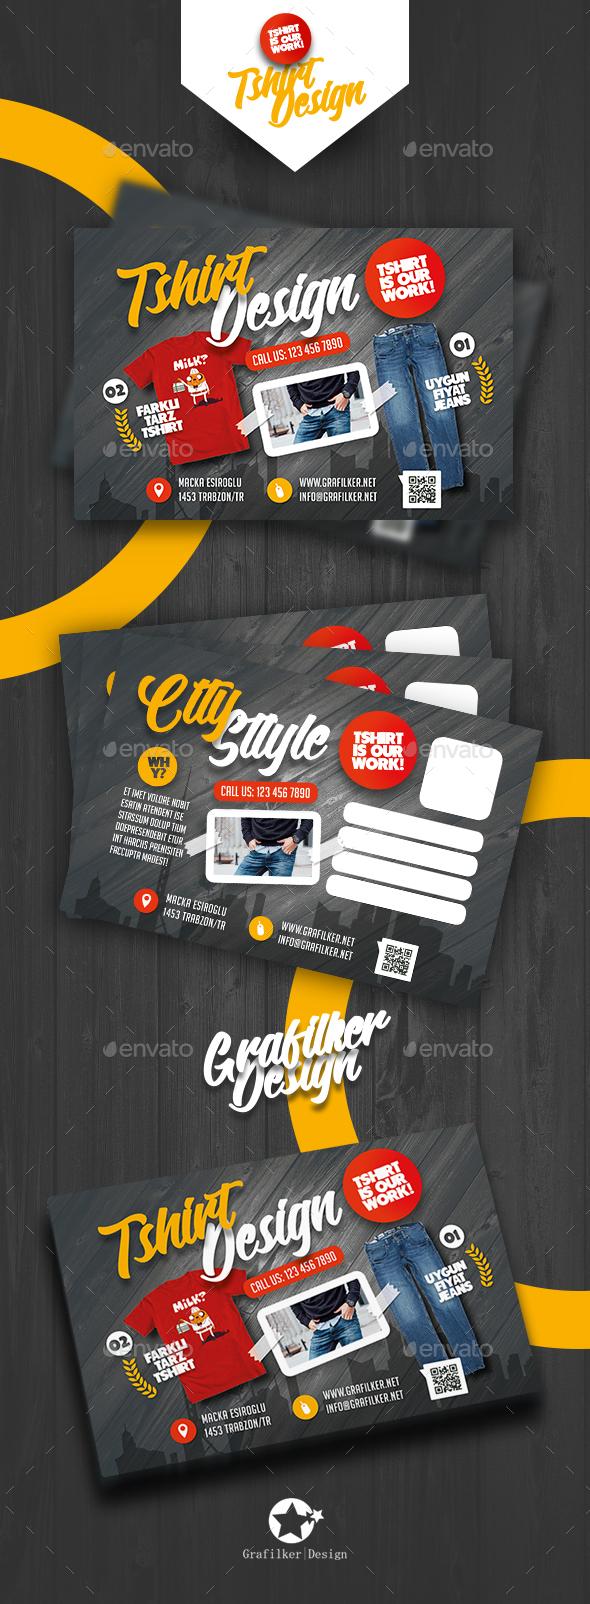 T-Shirt Shop Postcard Templates - Cards & Invites Print Templates